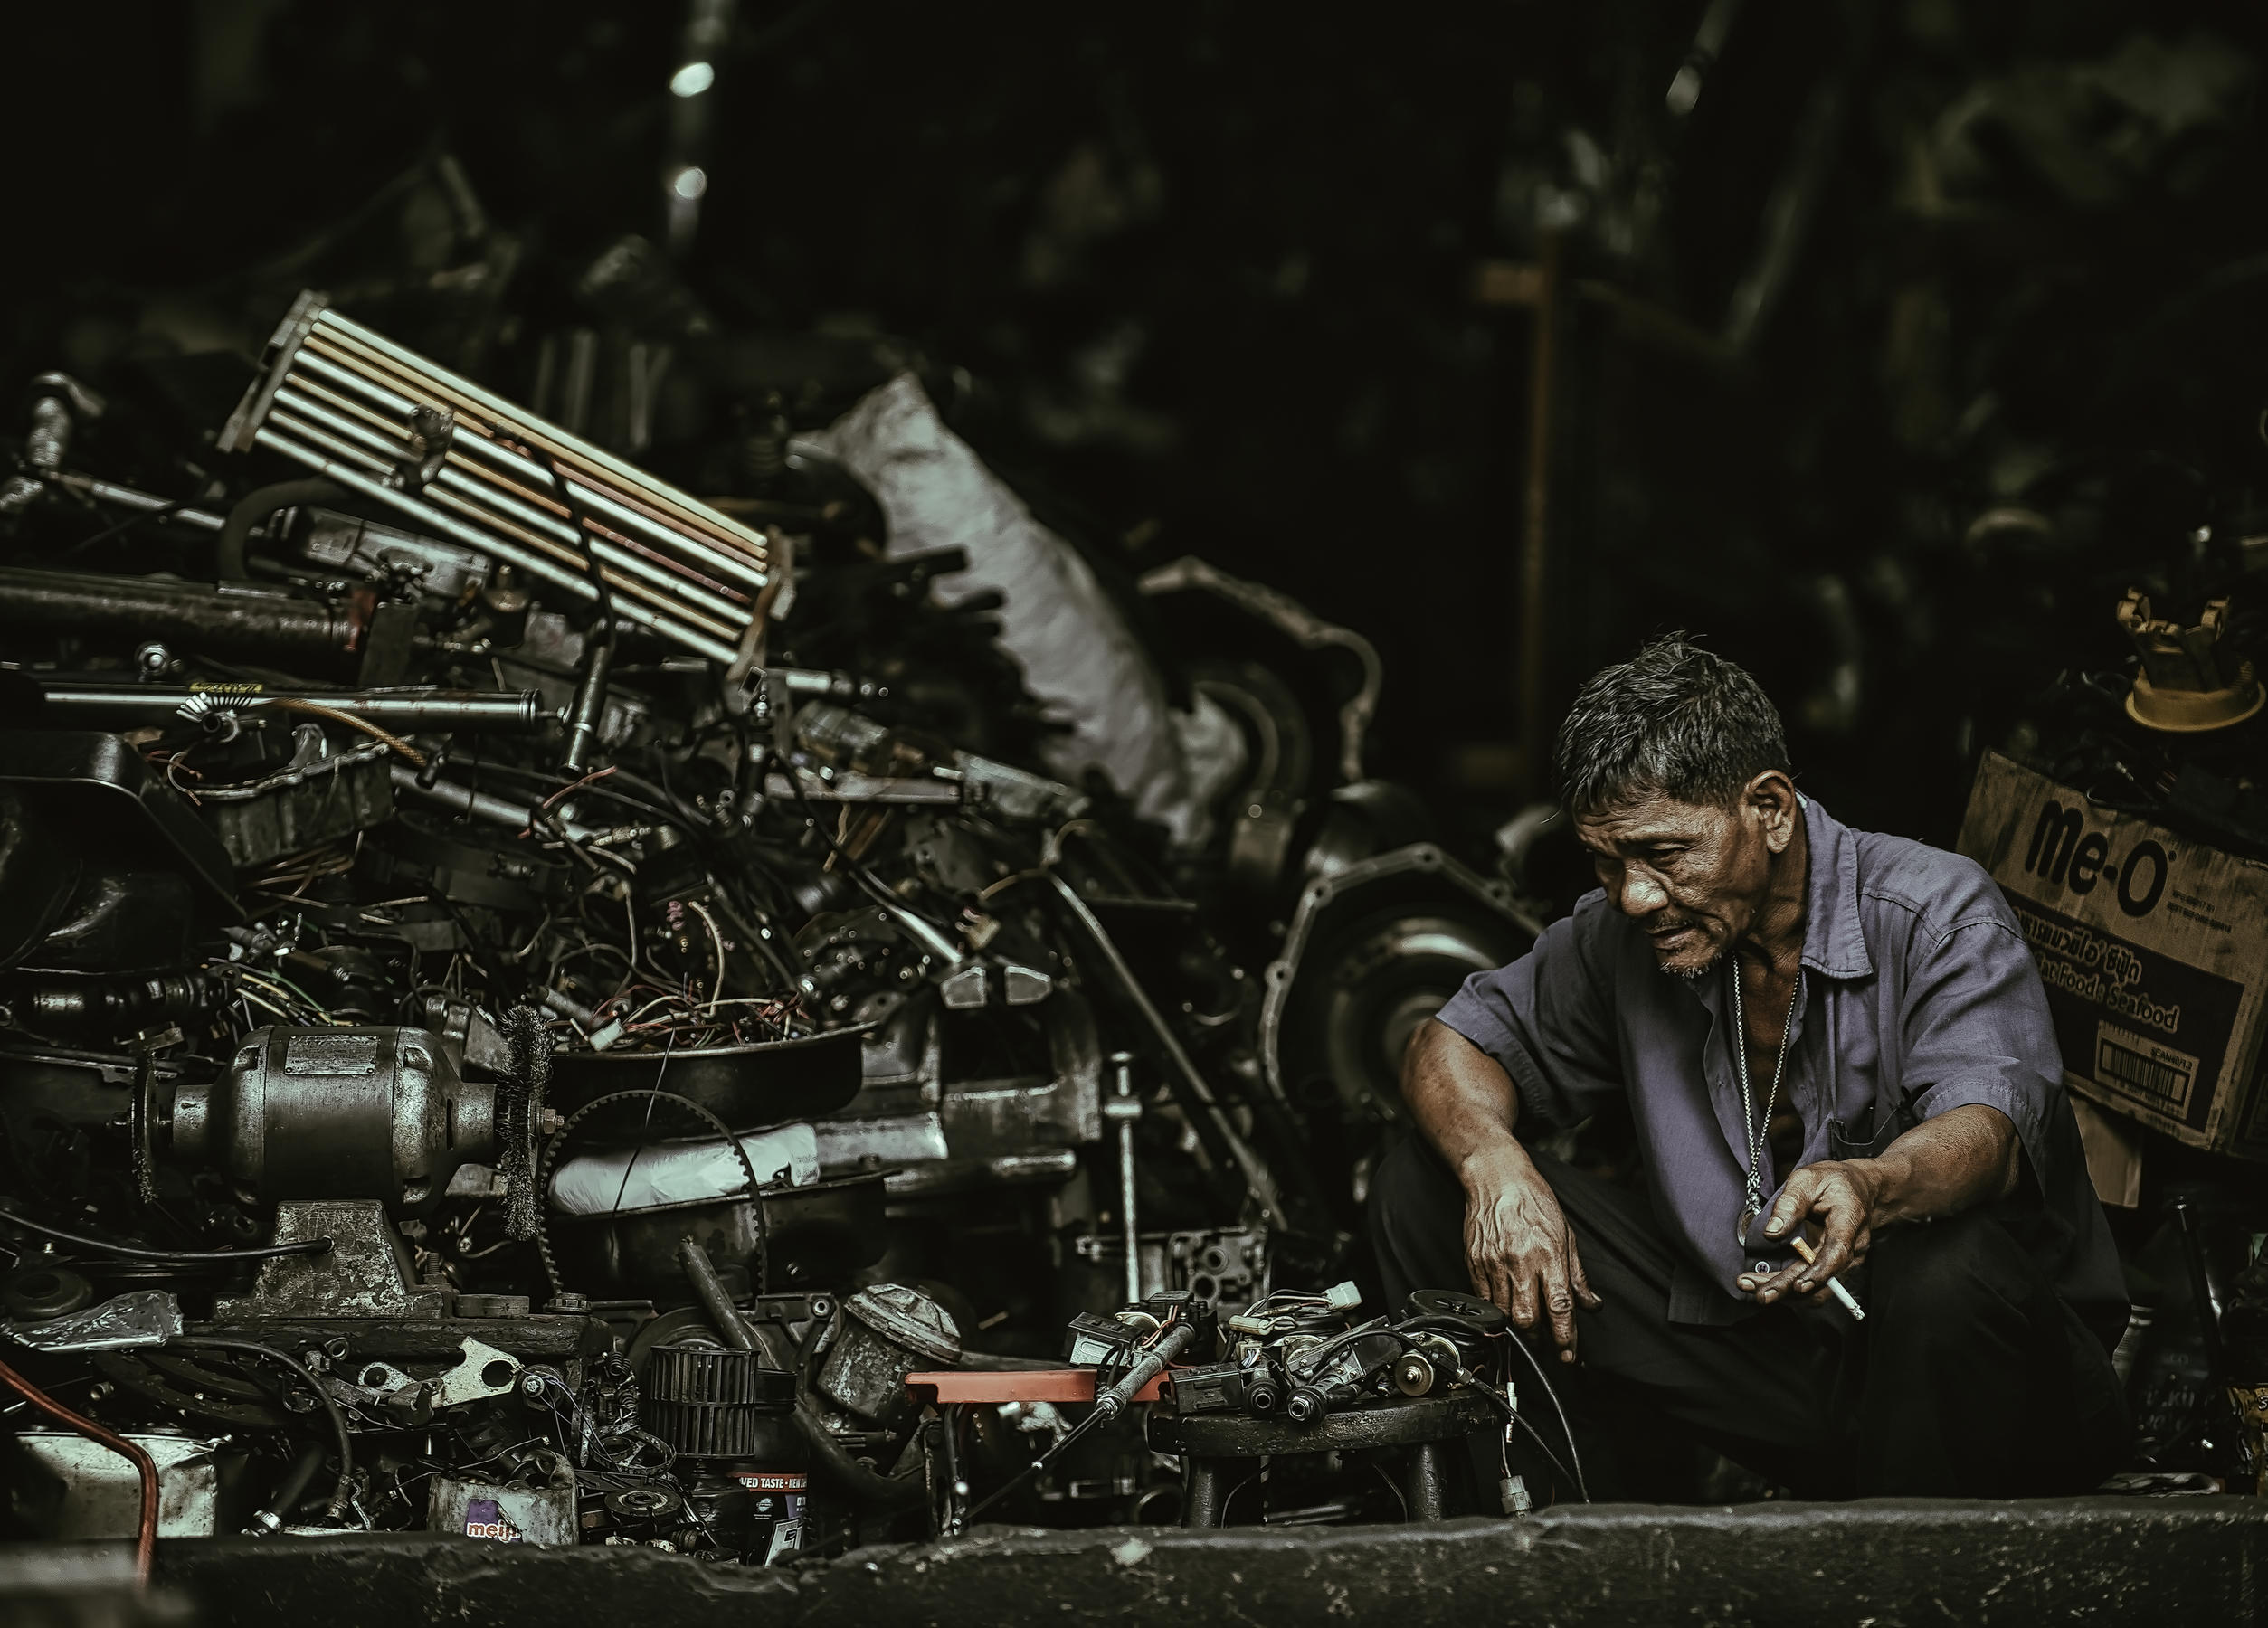 Viraj Bunnag (Thailand), End of a long day, 2017